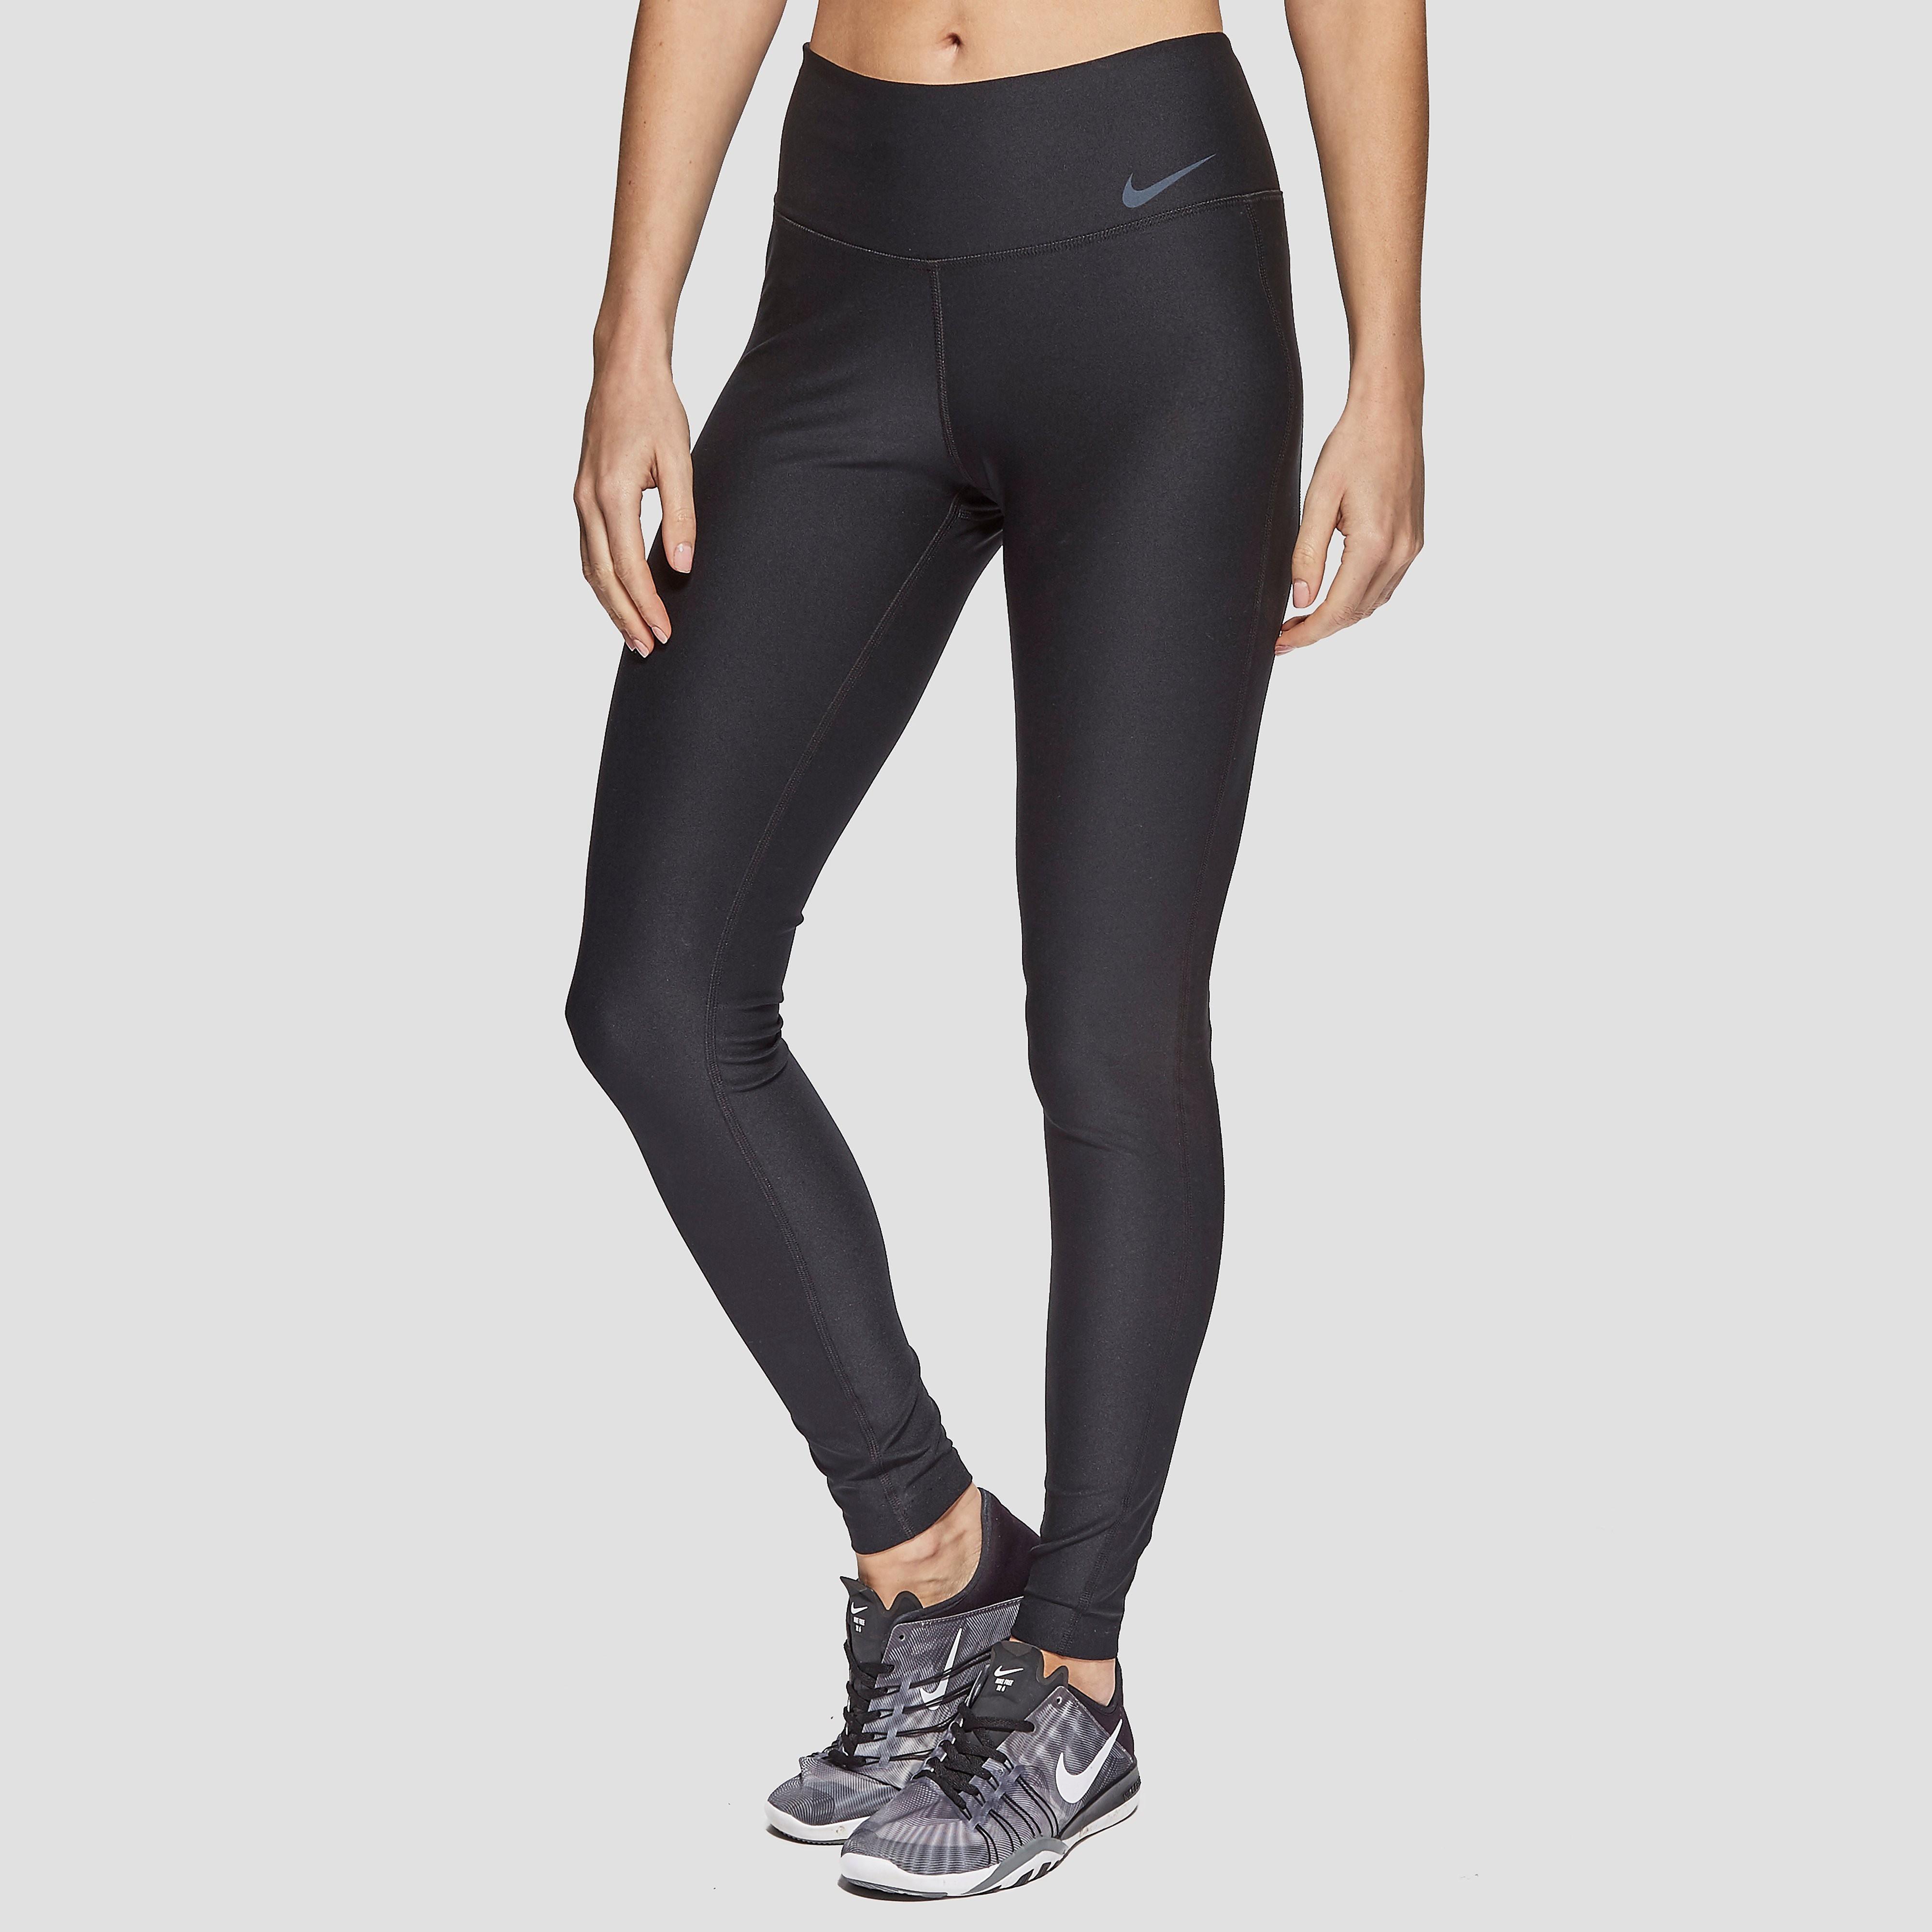 Nike Power Women's Tight